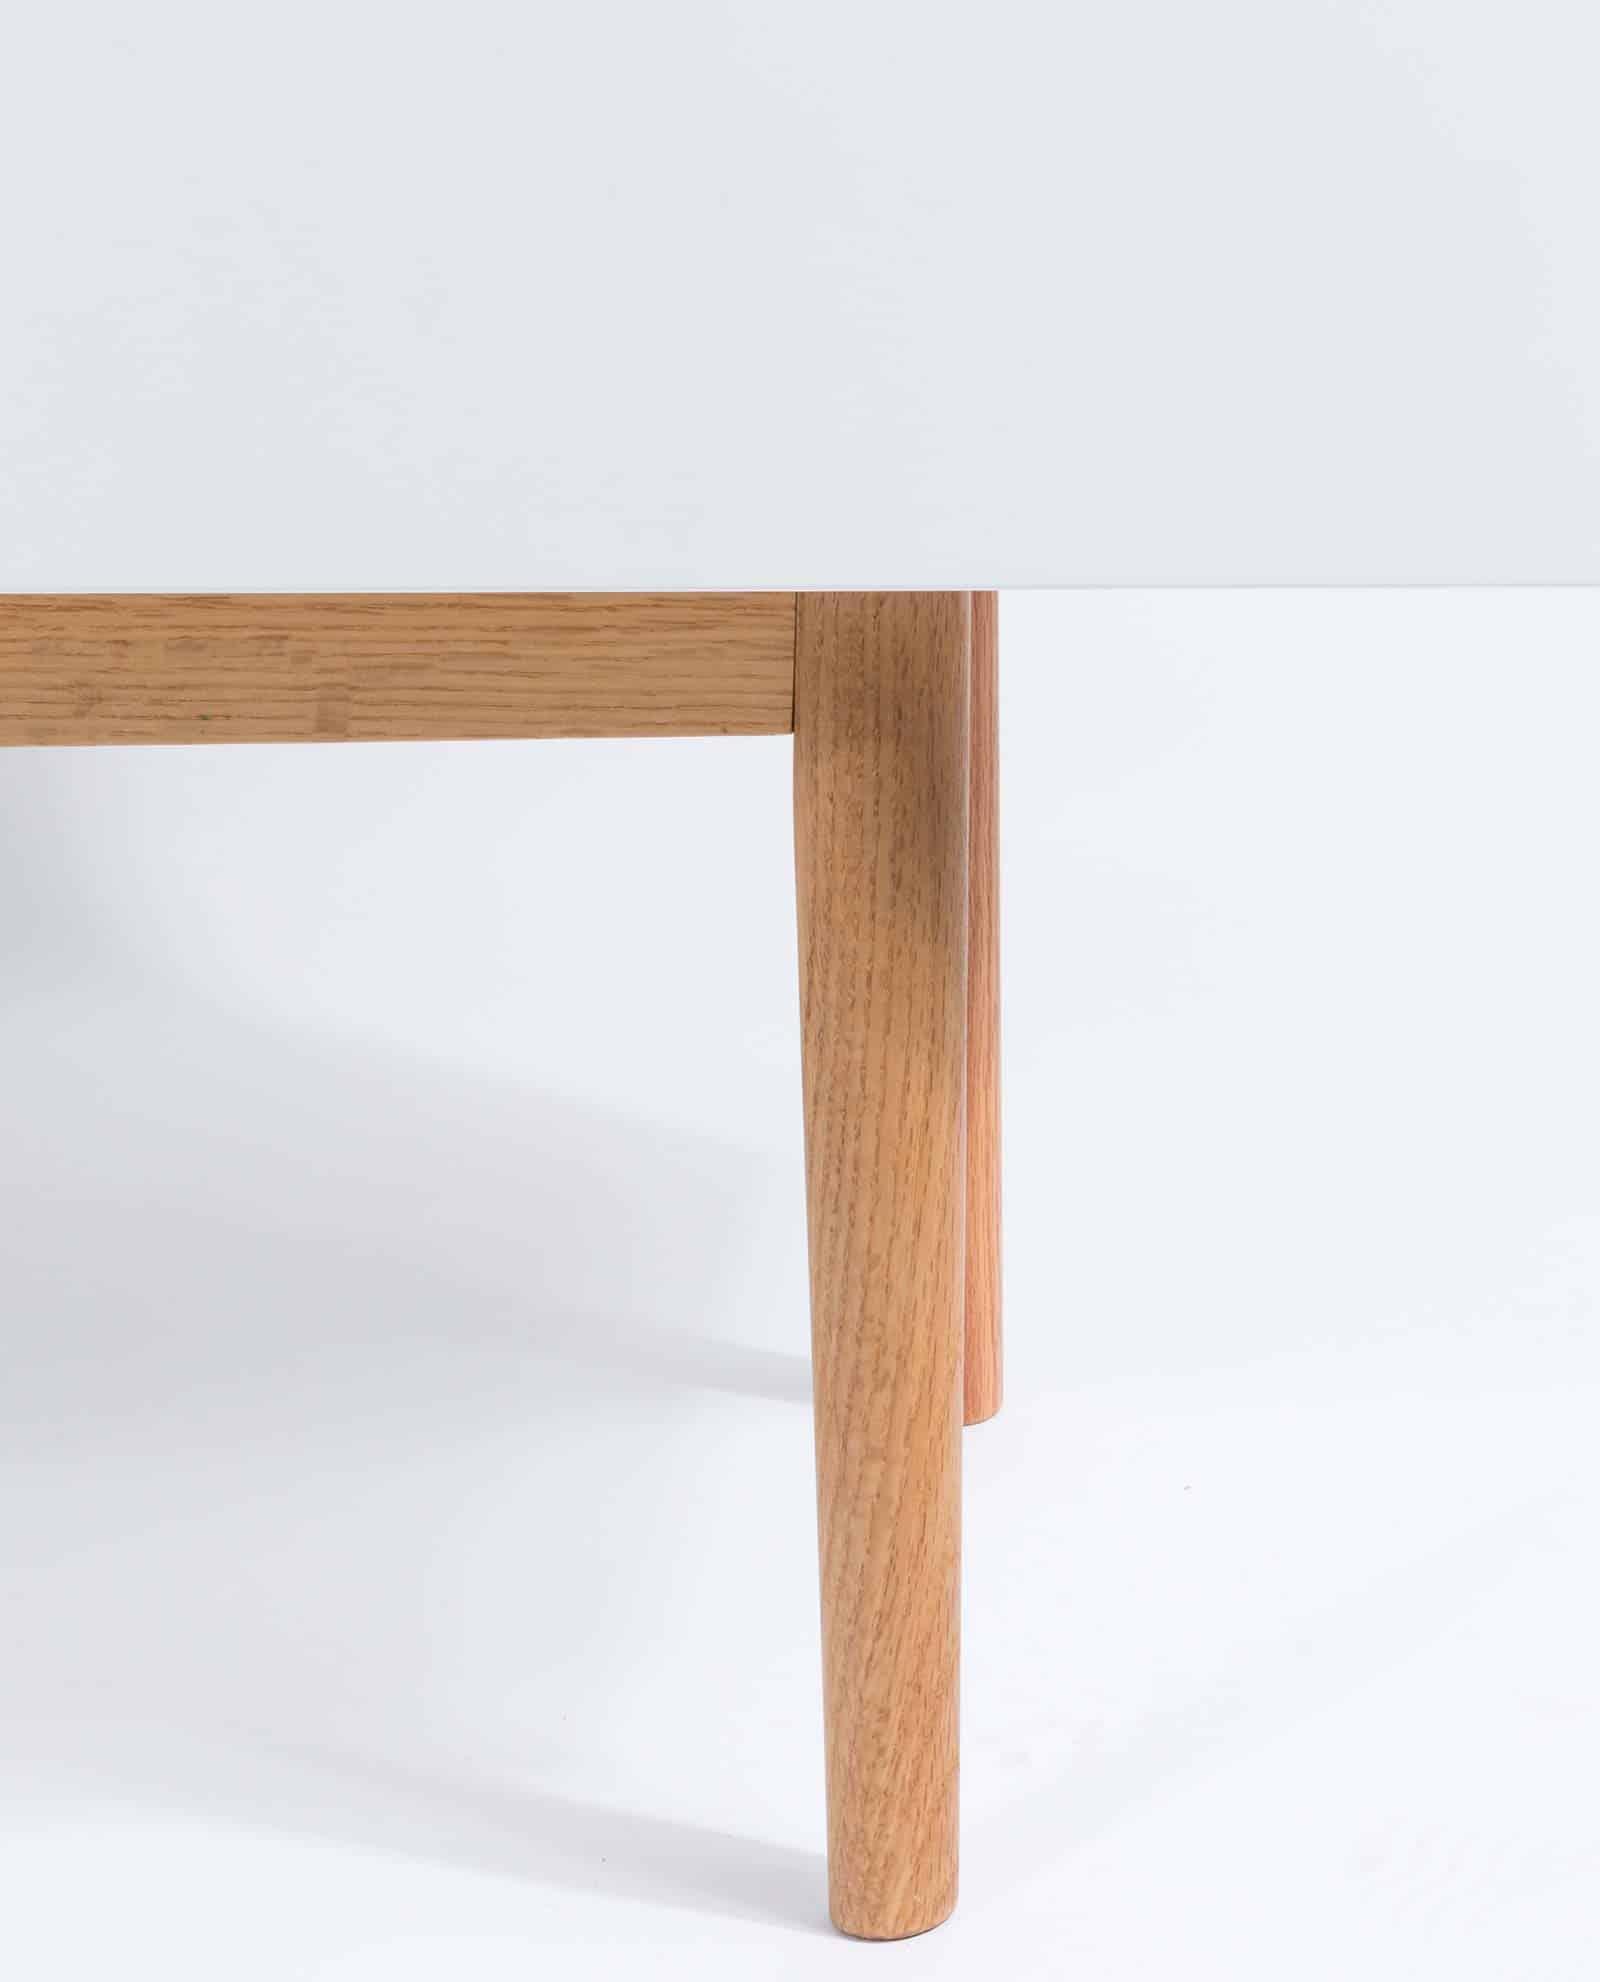 High On Wood Kast 2 Drawers 2 Doors By Zuiver Designshopp